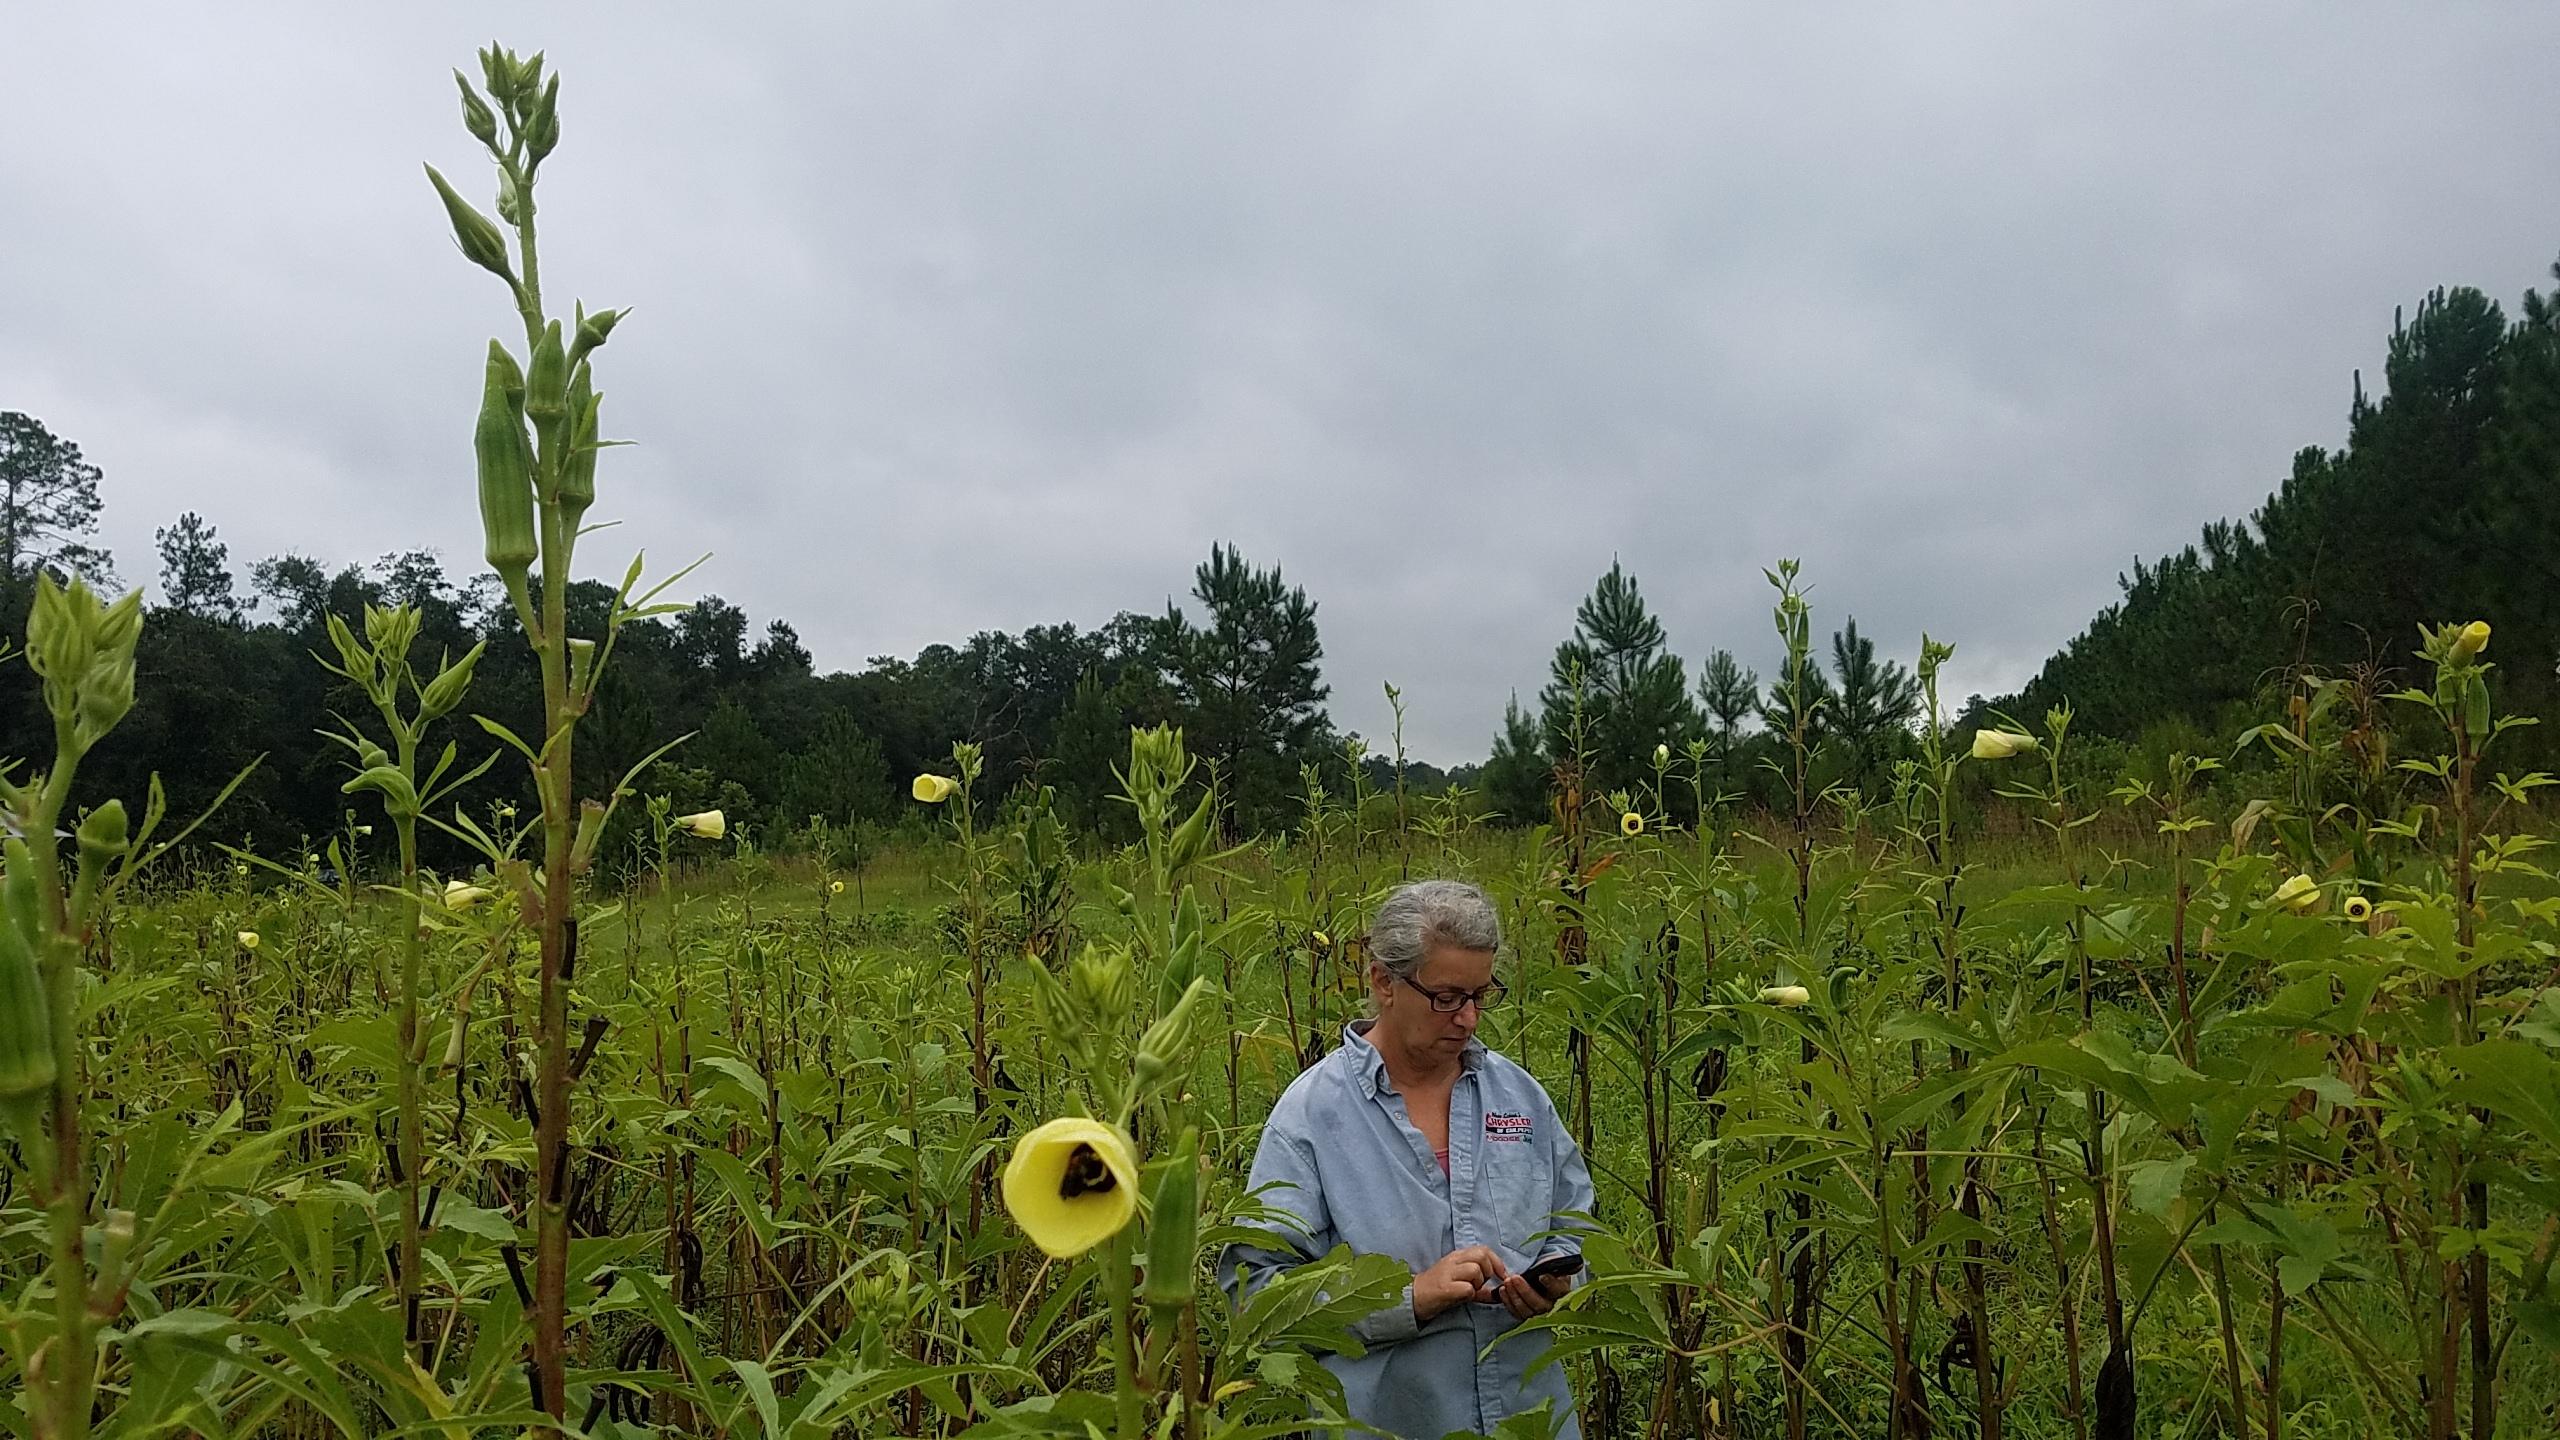 2560x1440 Bee in okra flower Gretchen, Okra, in Swamp and Garden, by John S. Quarterman, for OkraParadiseFarms.com, 30 July 2017